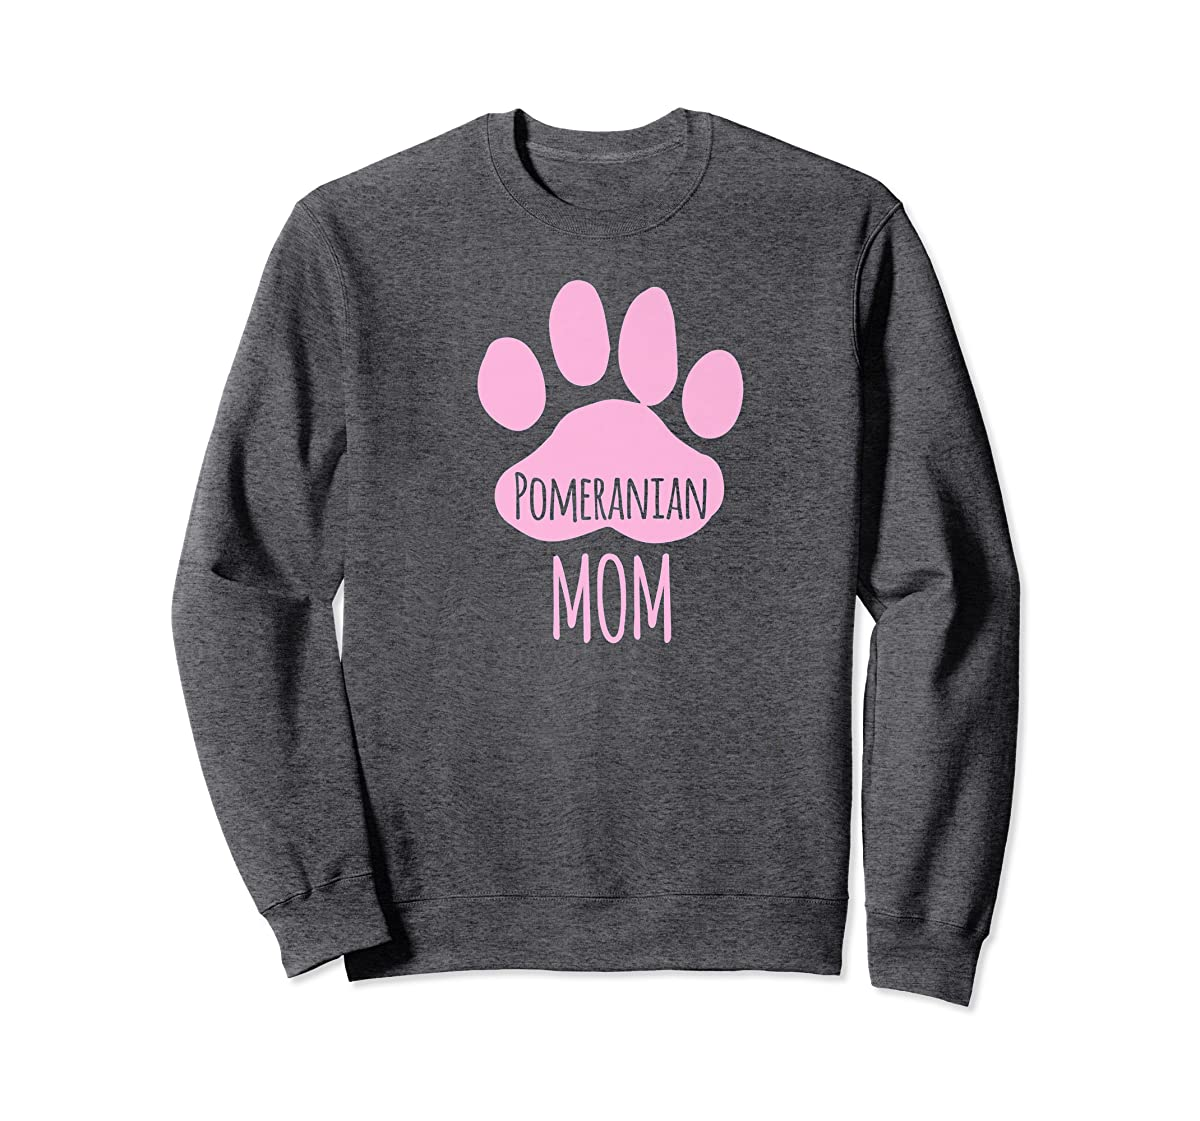 Cute Pomeranian Mom T Shirt for Pom Owner Dog Paw Pink-Sweatshirt-Dark Heather